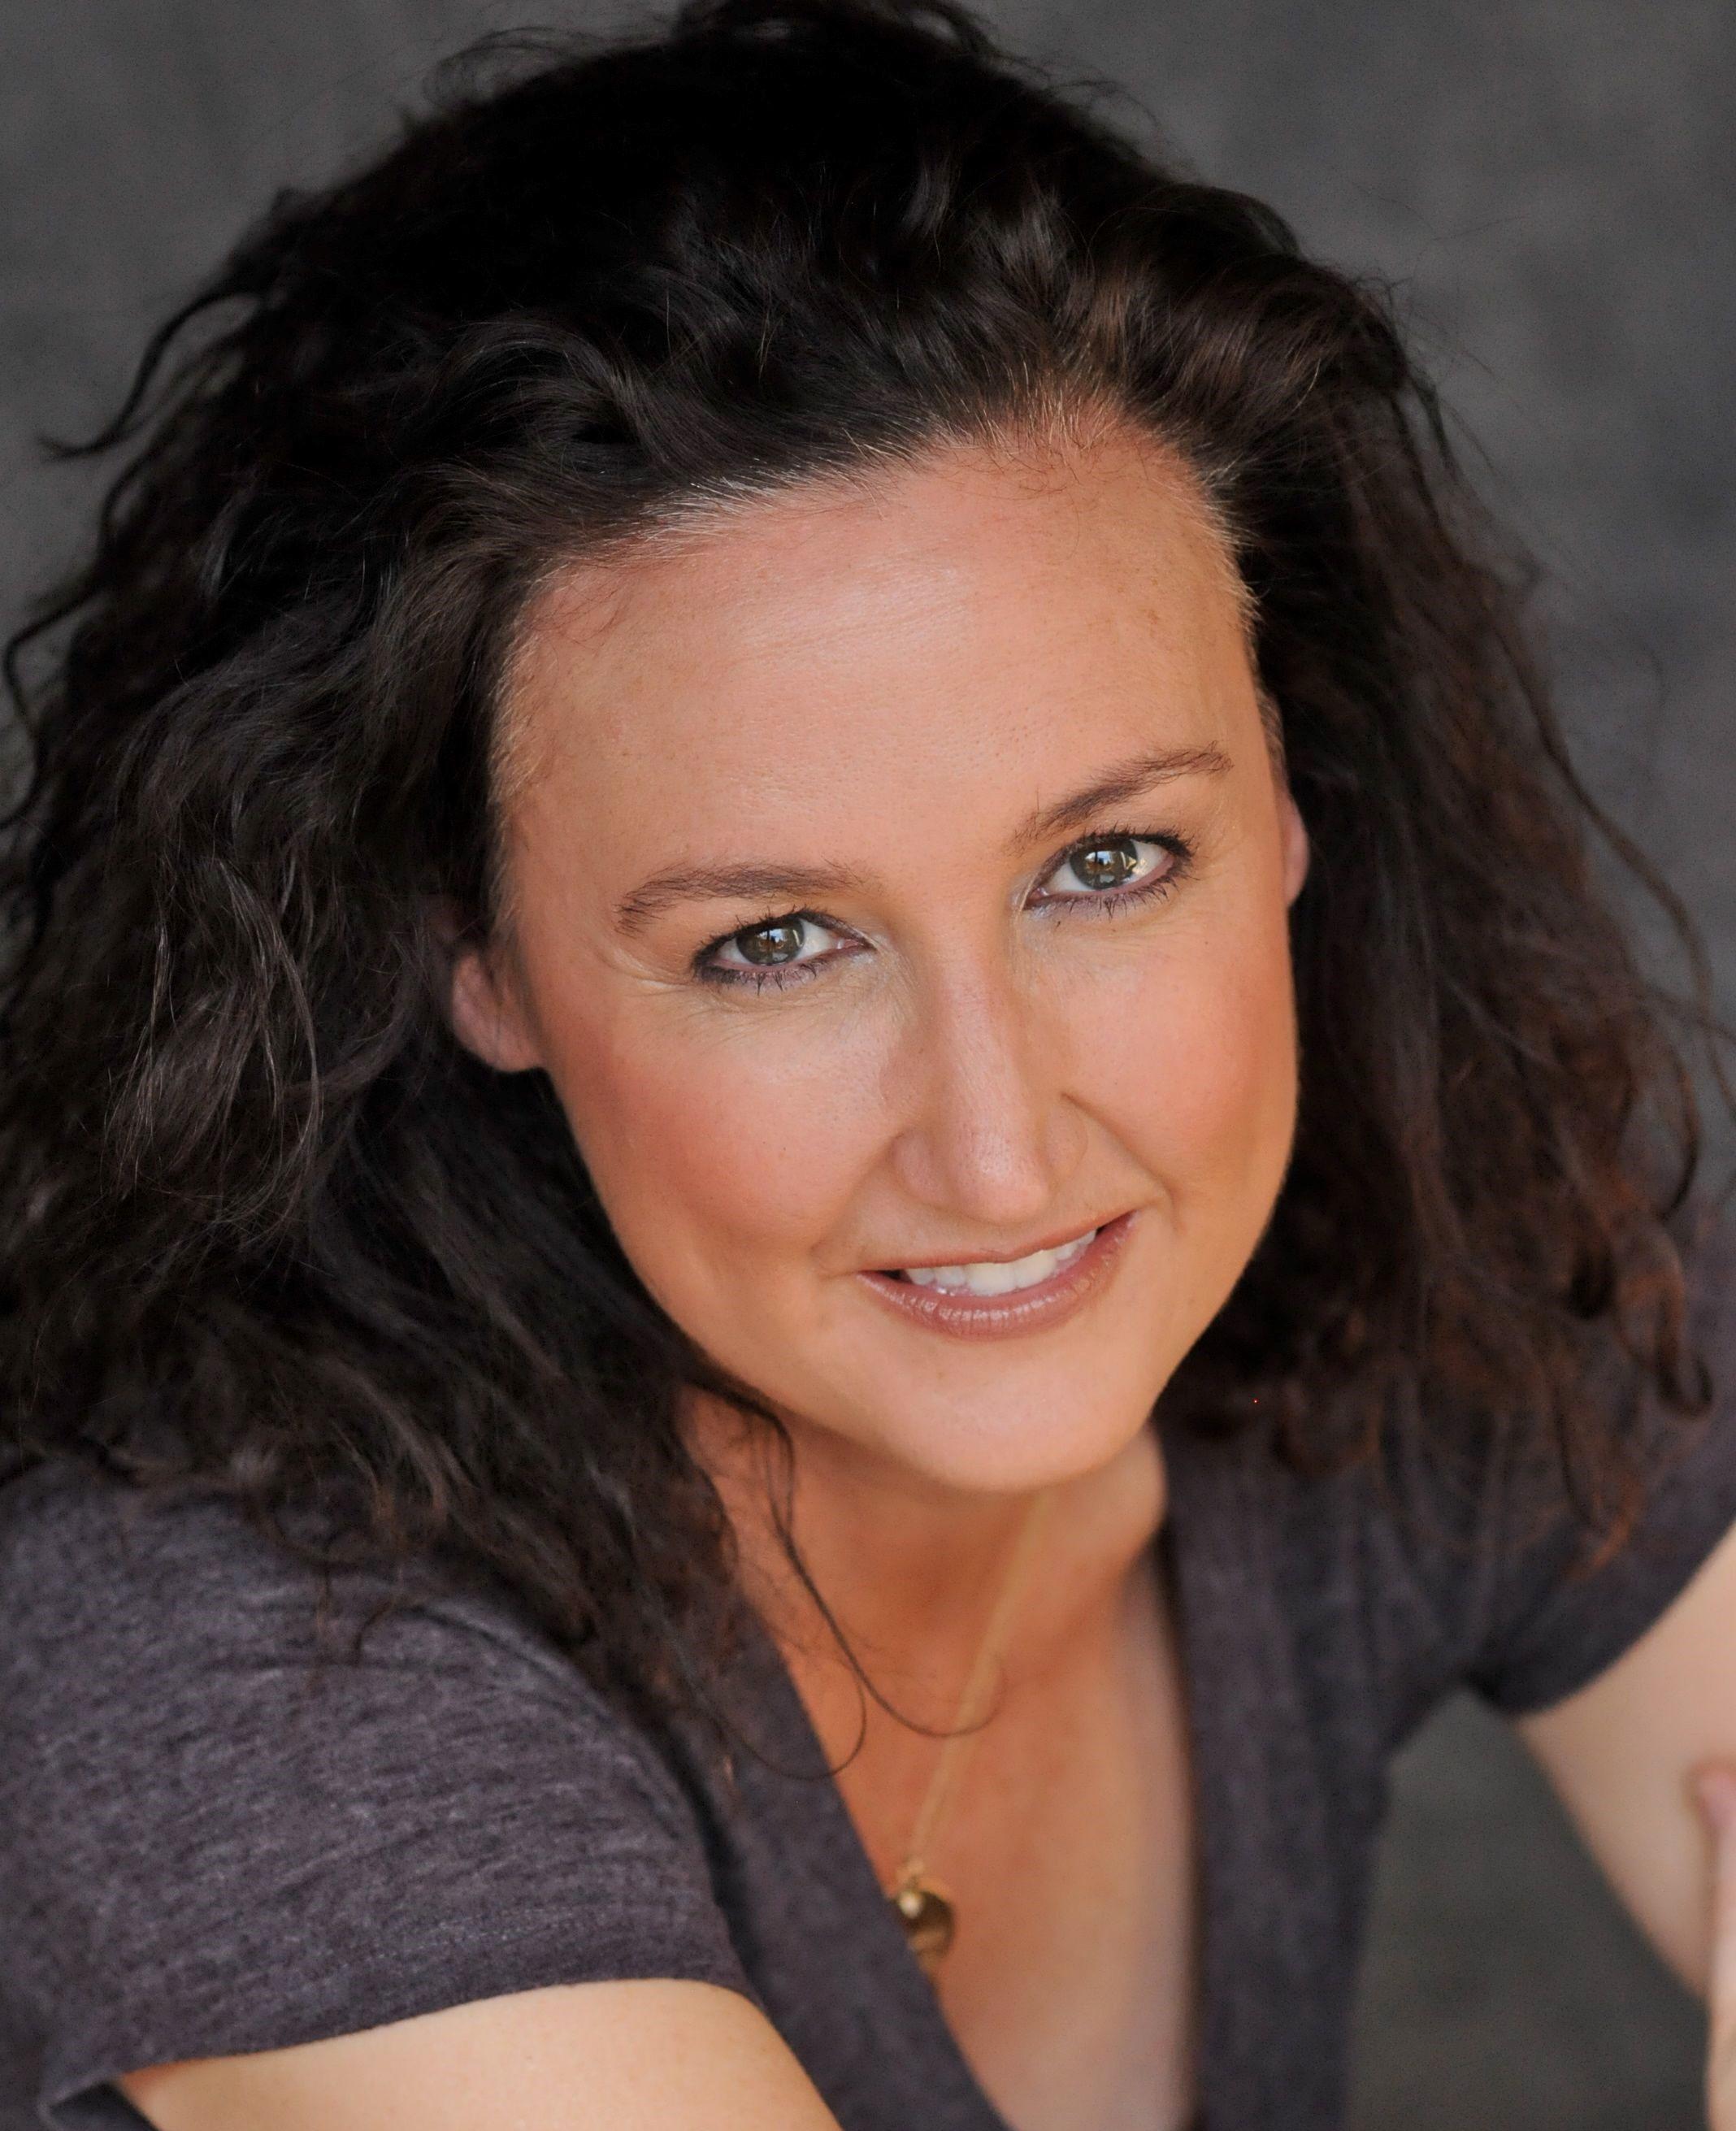 Kelly Frazier